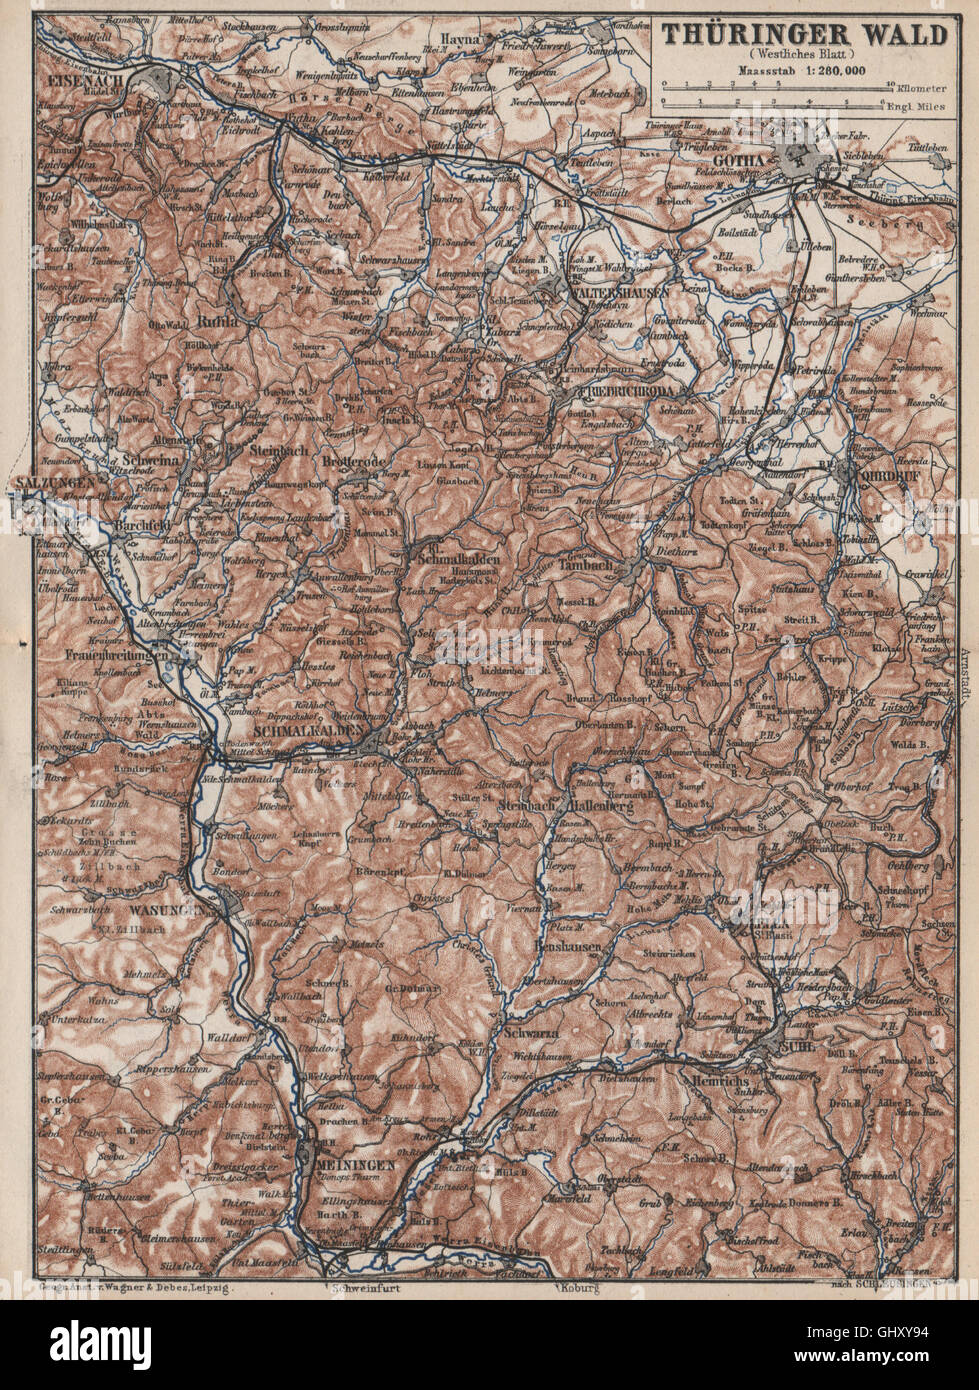 Thüringer Wald Karte.Thüringer Wald West Thüringer Wald Gotha Meiningen Eisenach Zella